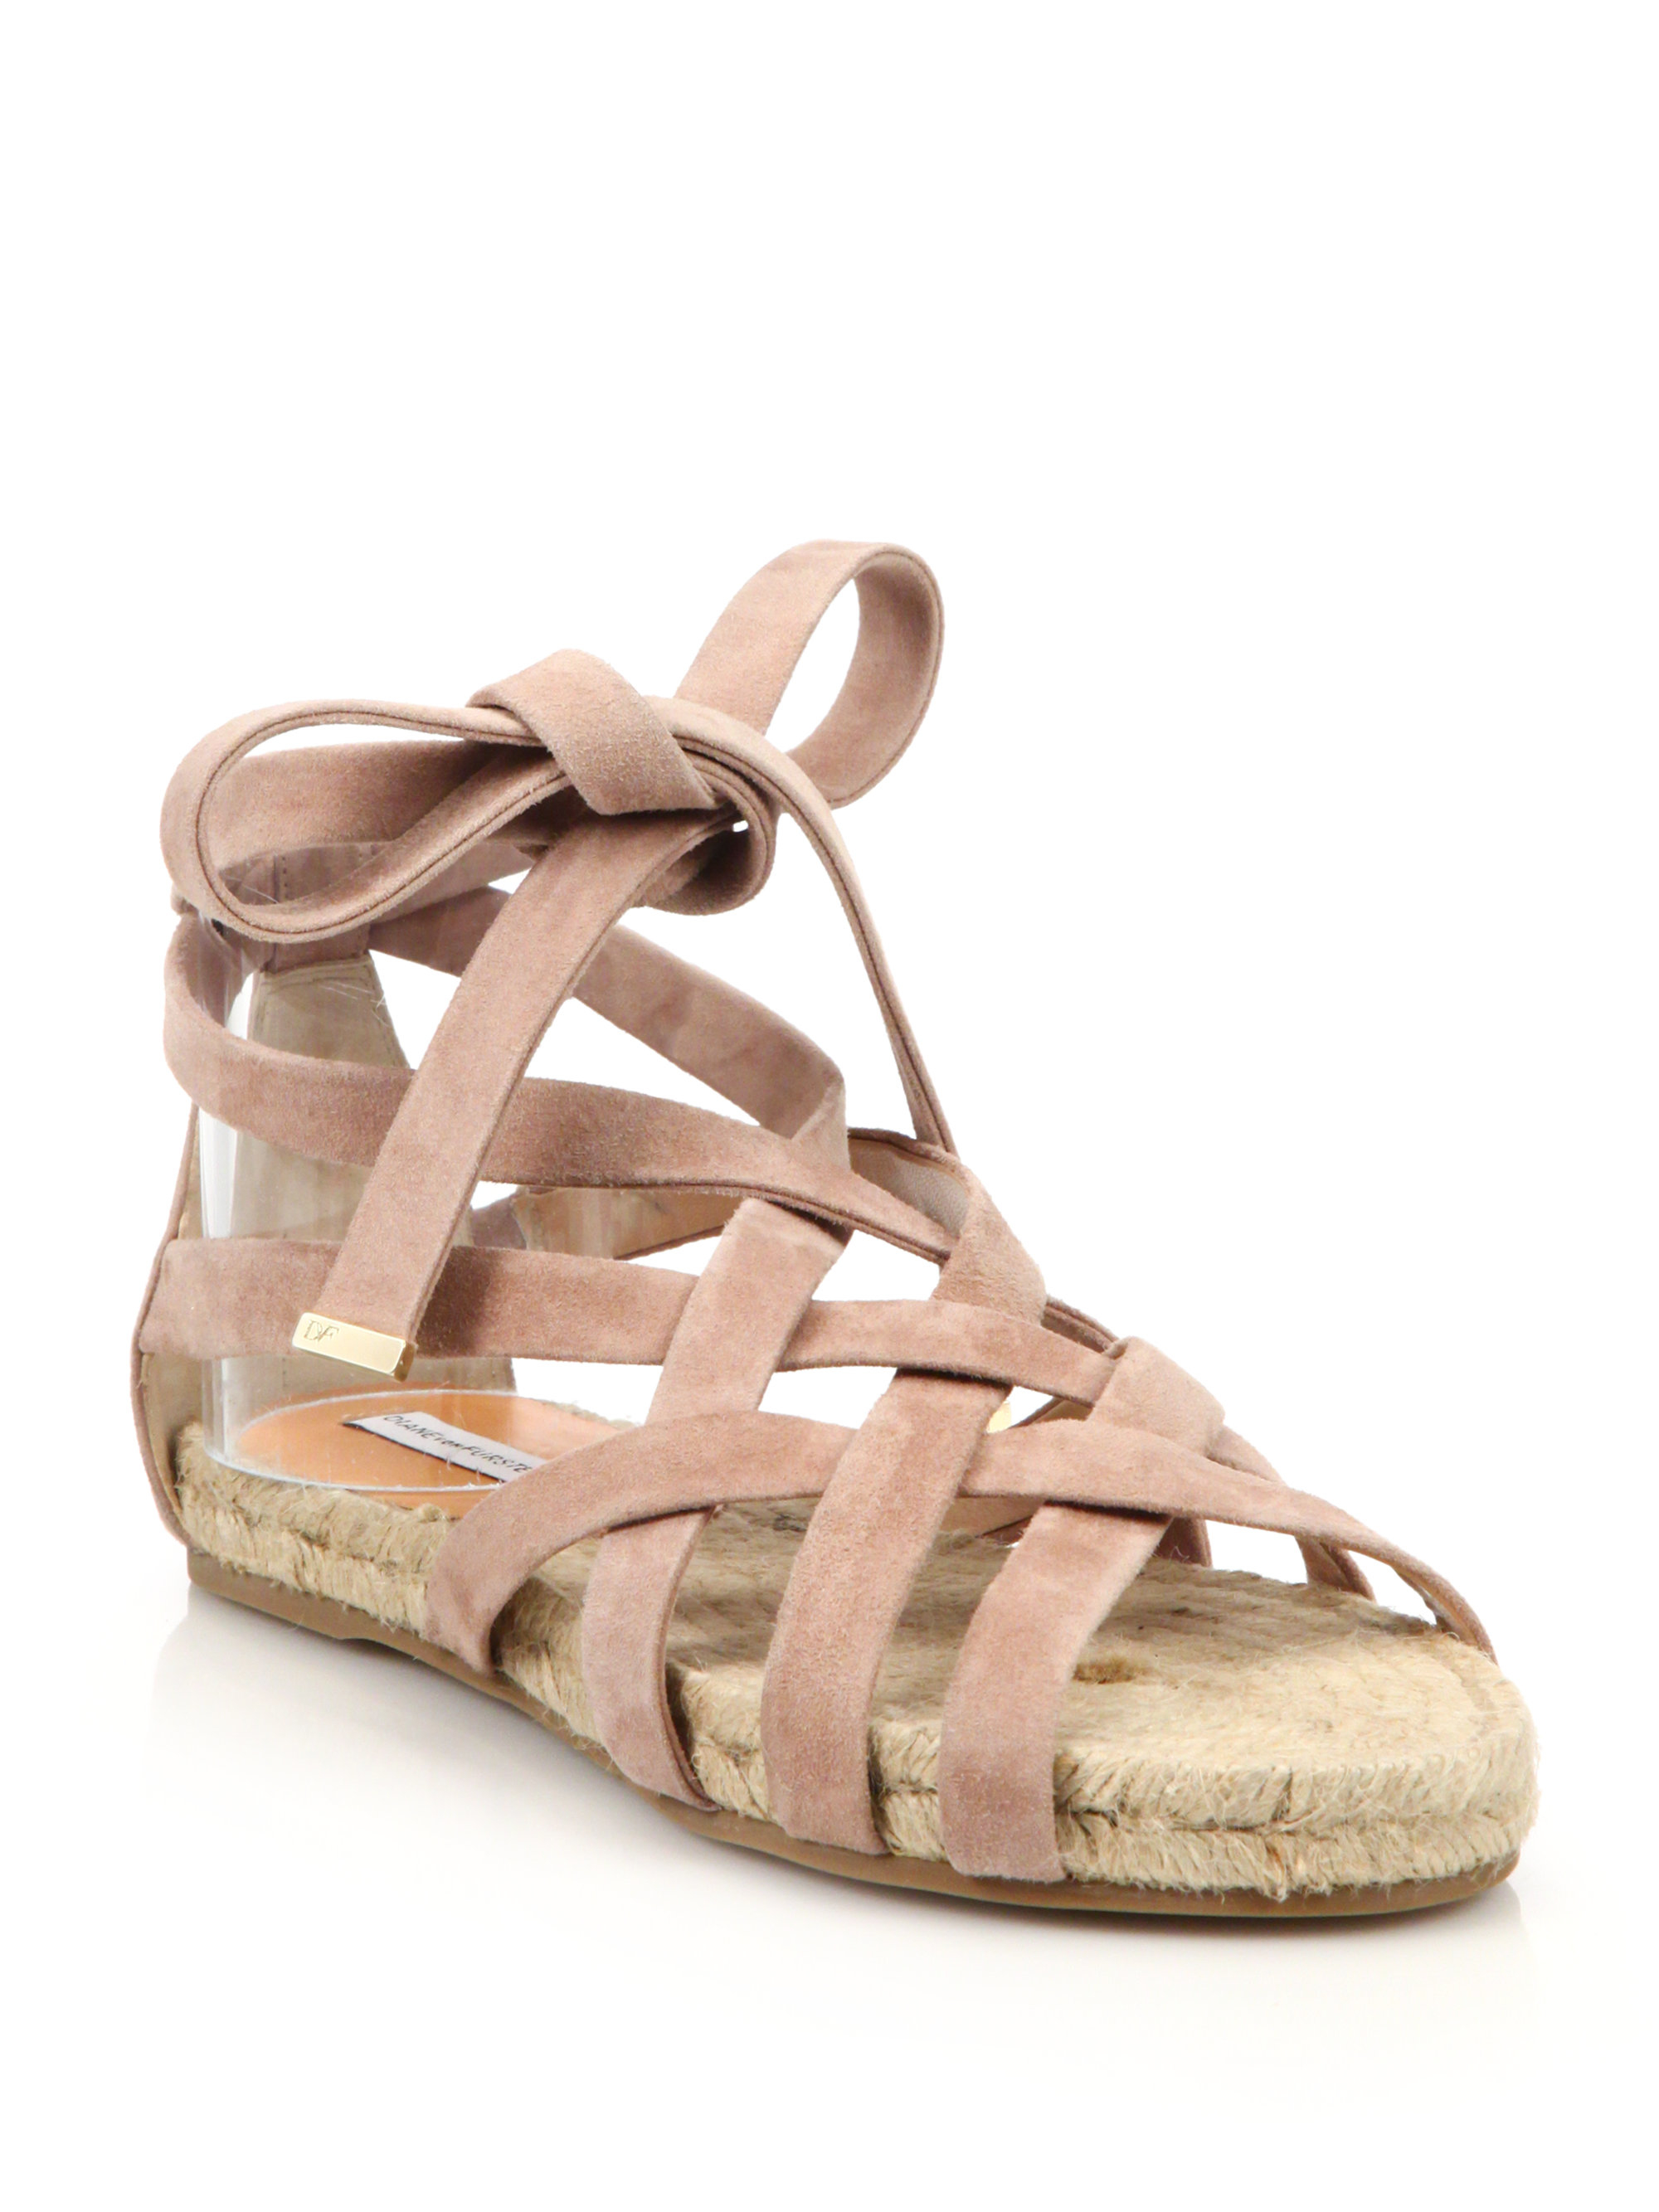 Diane von Furstenberg Suede Fringe-Trimmed Sandals cheap sale pre order rtgXsv0S4T